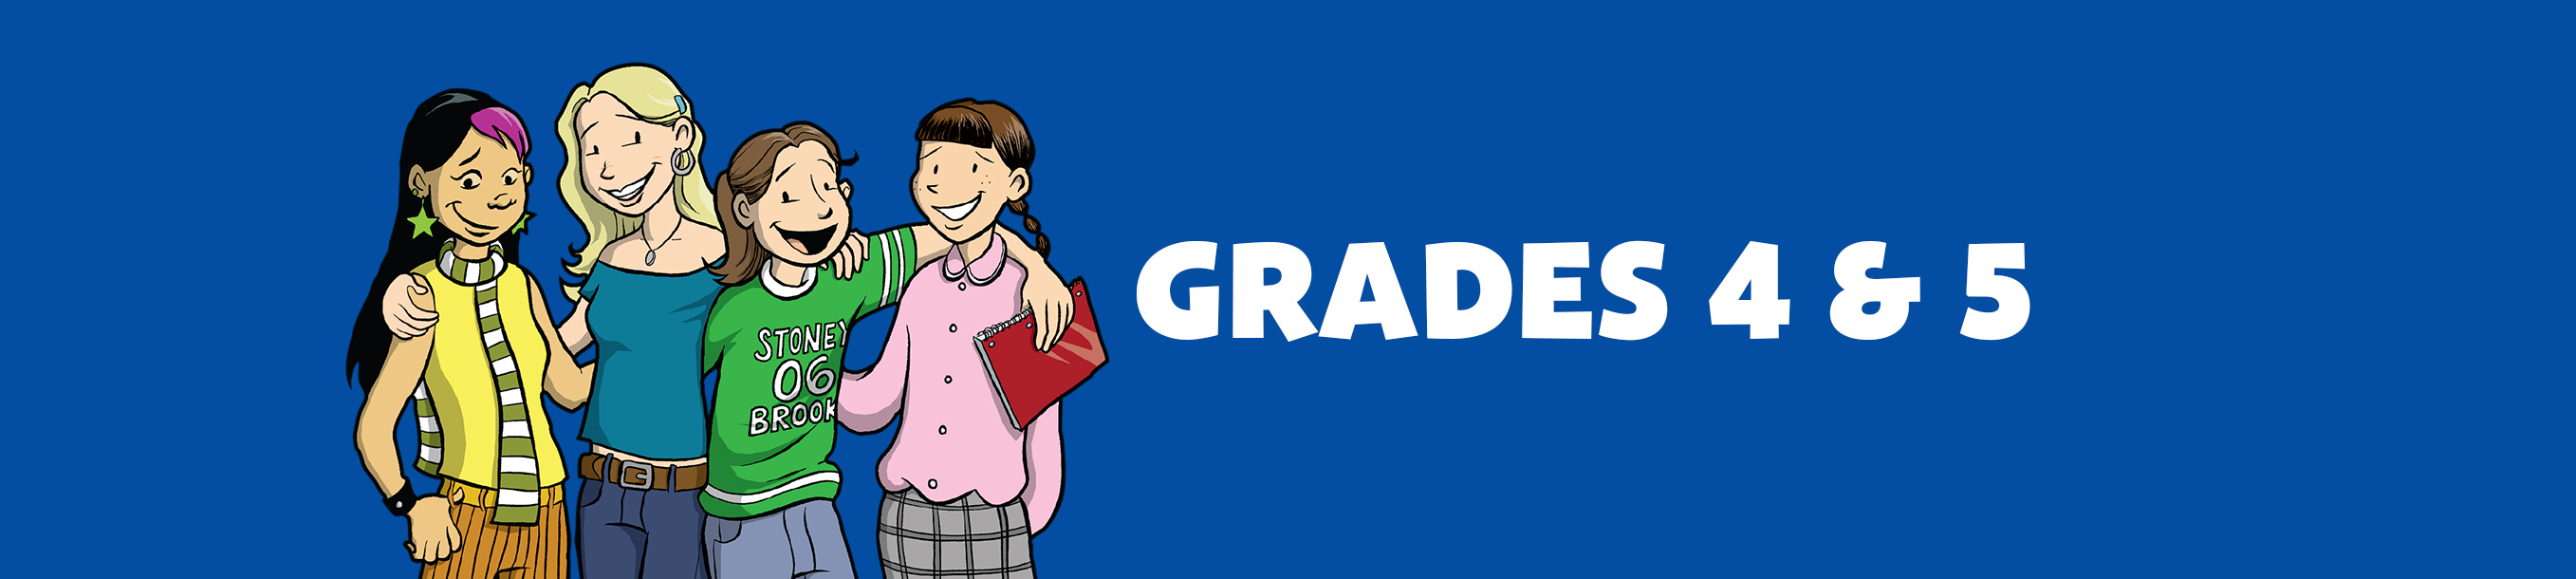 Grades 4 & 5